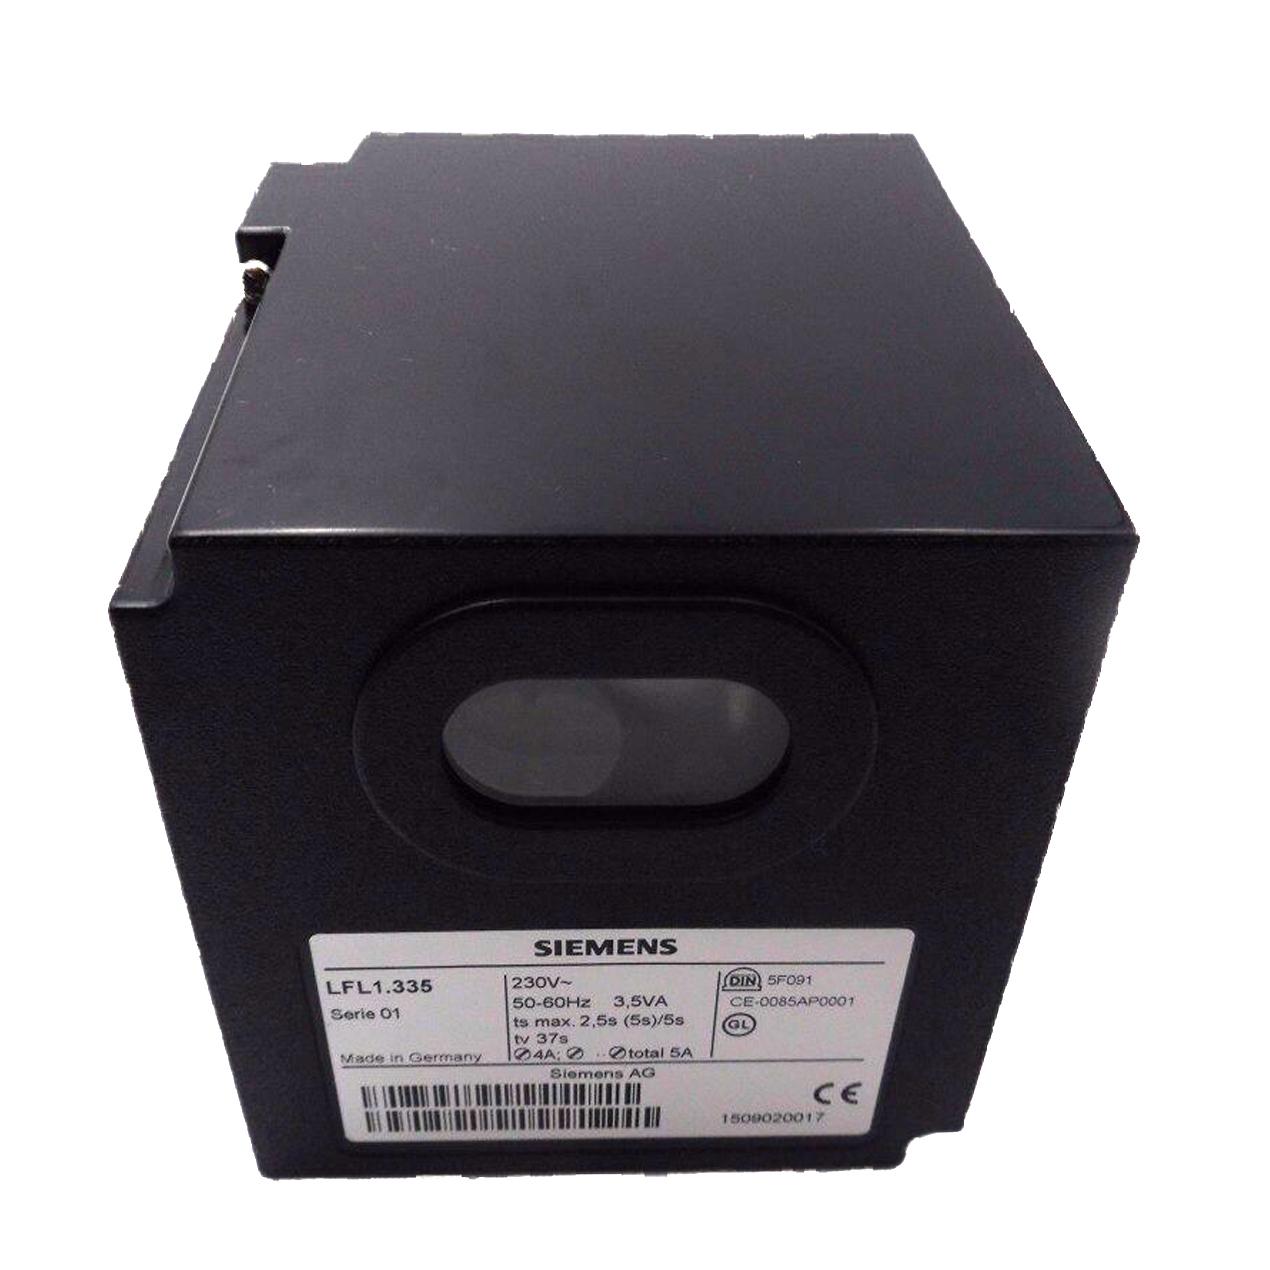 Siemens LFL1.335 gas burner sequence controller